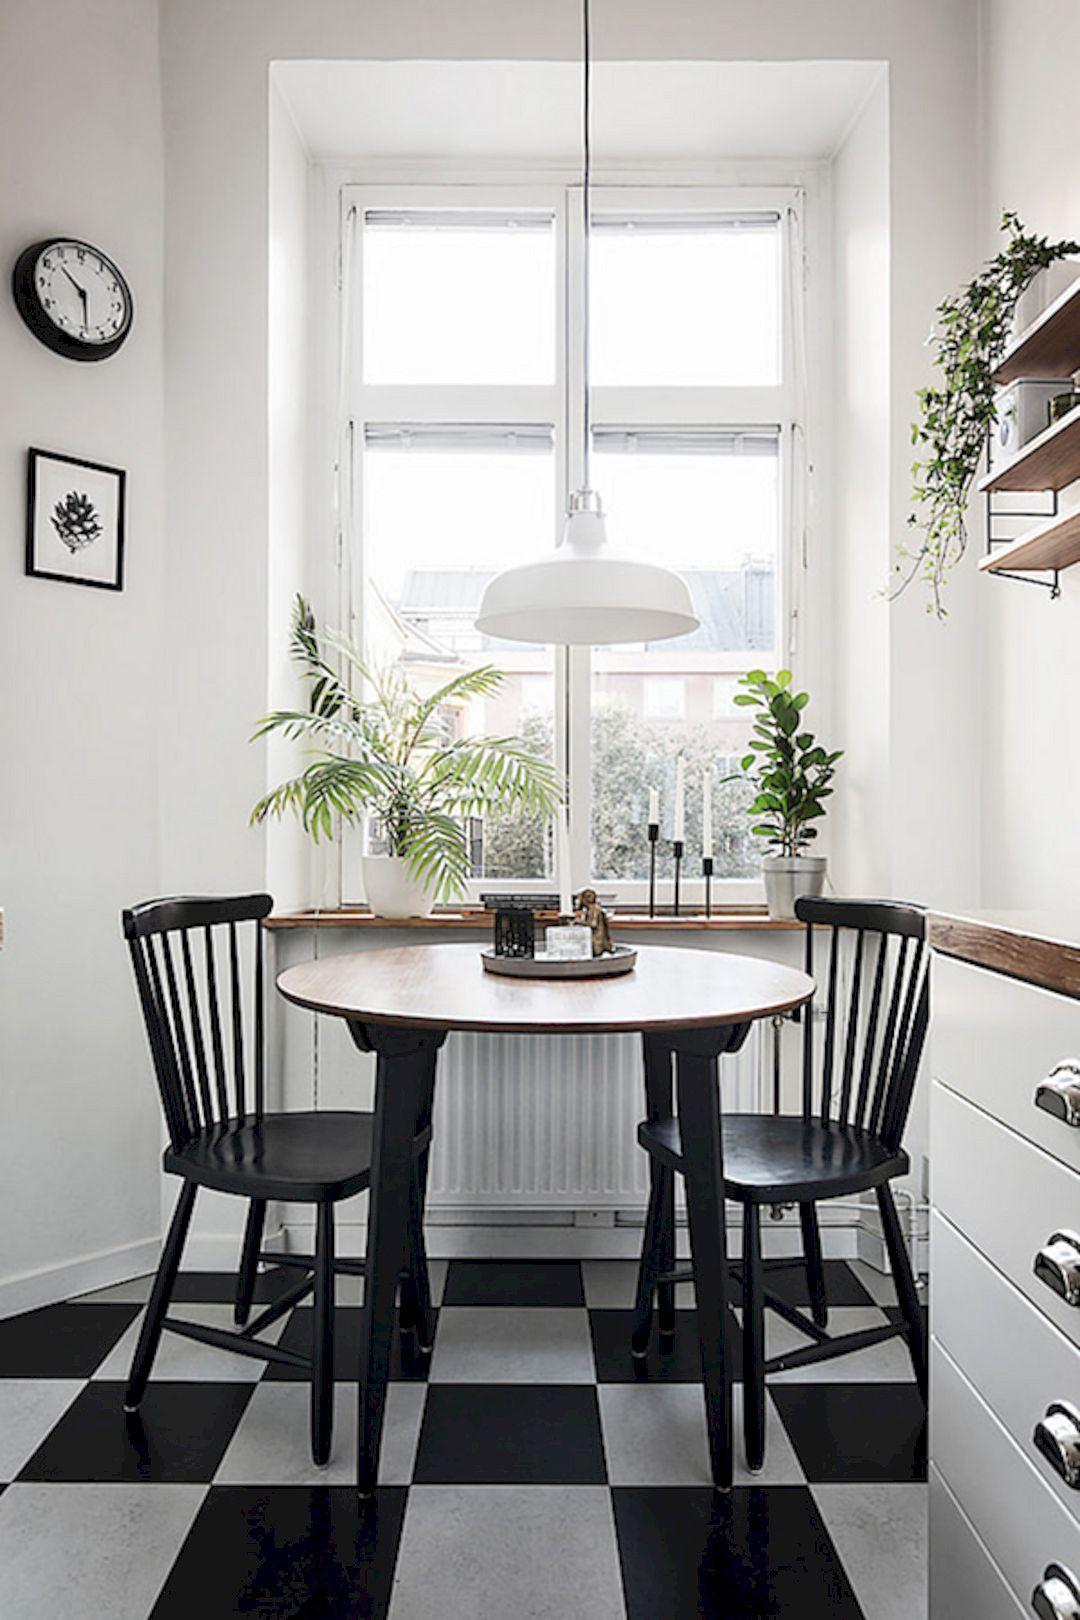 Exceptionnel 79 Astonishing Small Dining Room Designs  Https://www.futuristarchitecture.com/